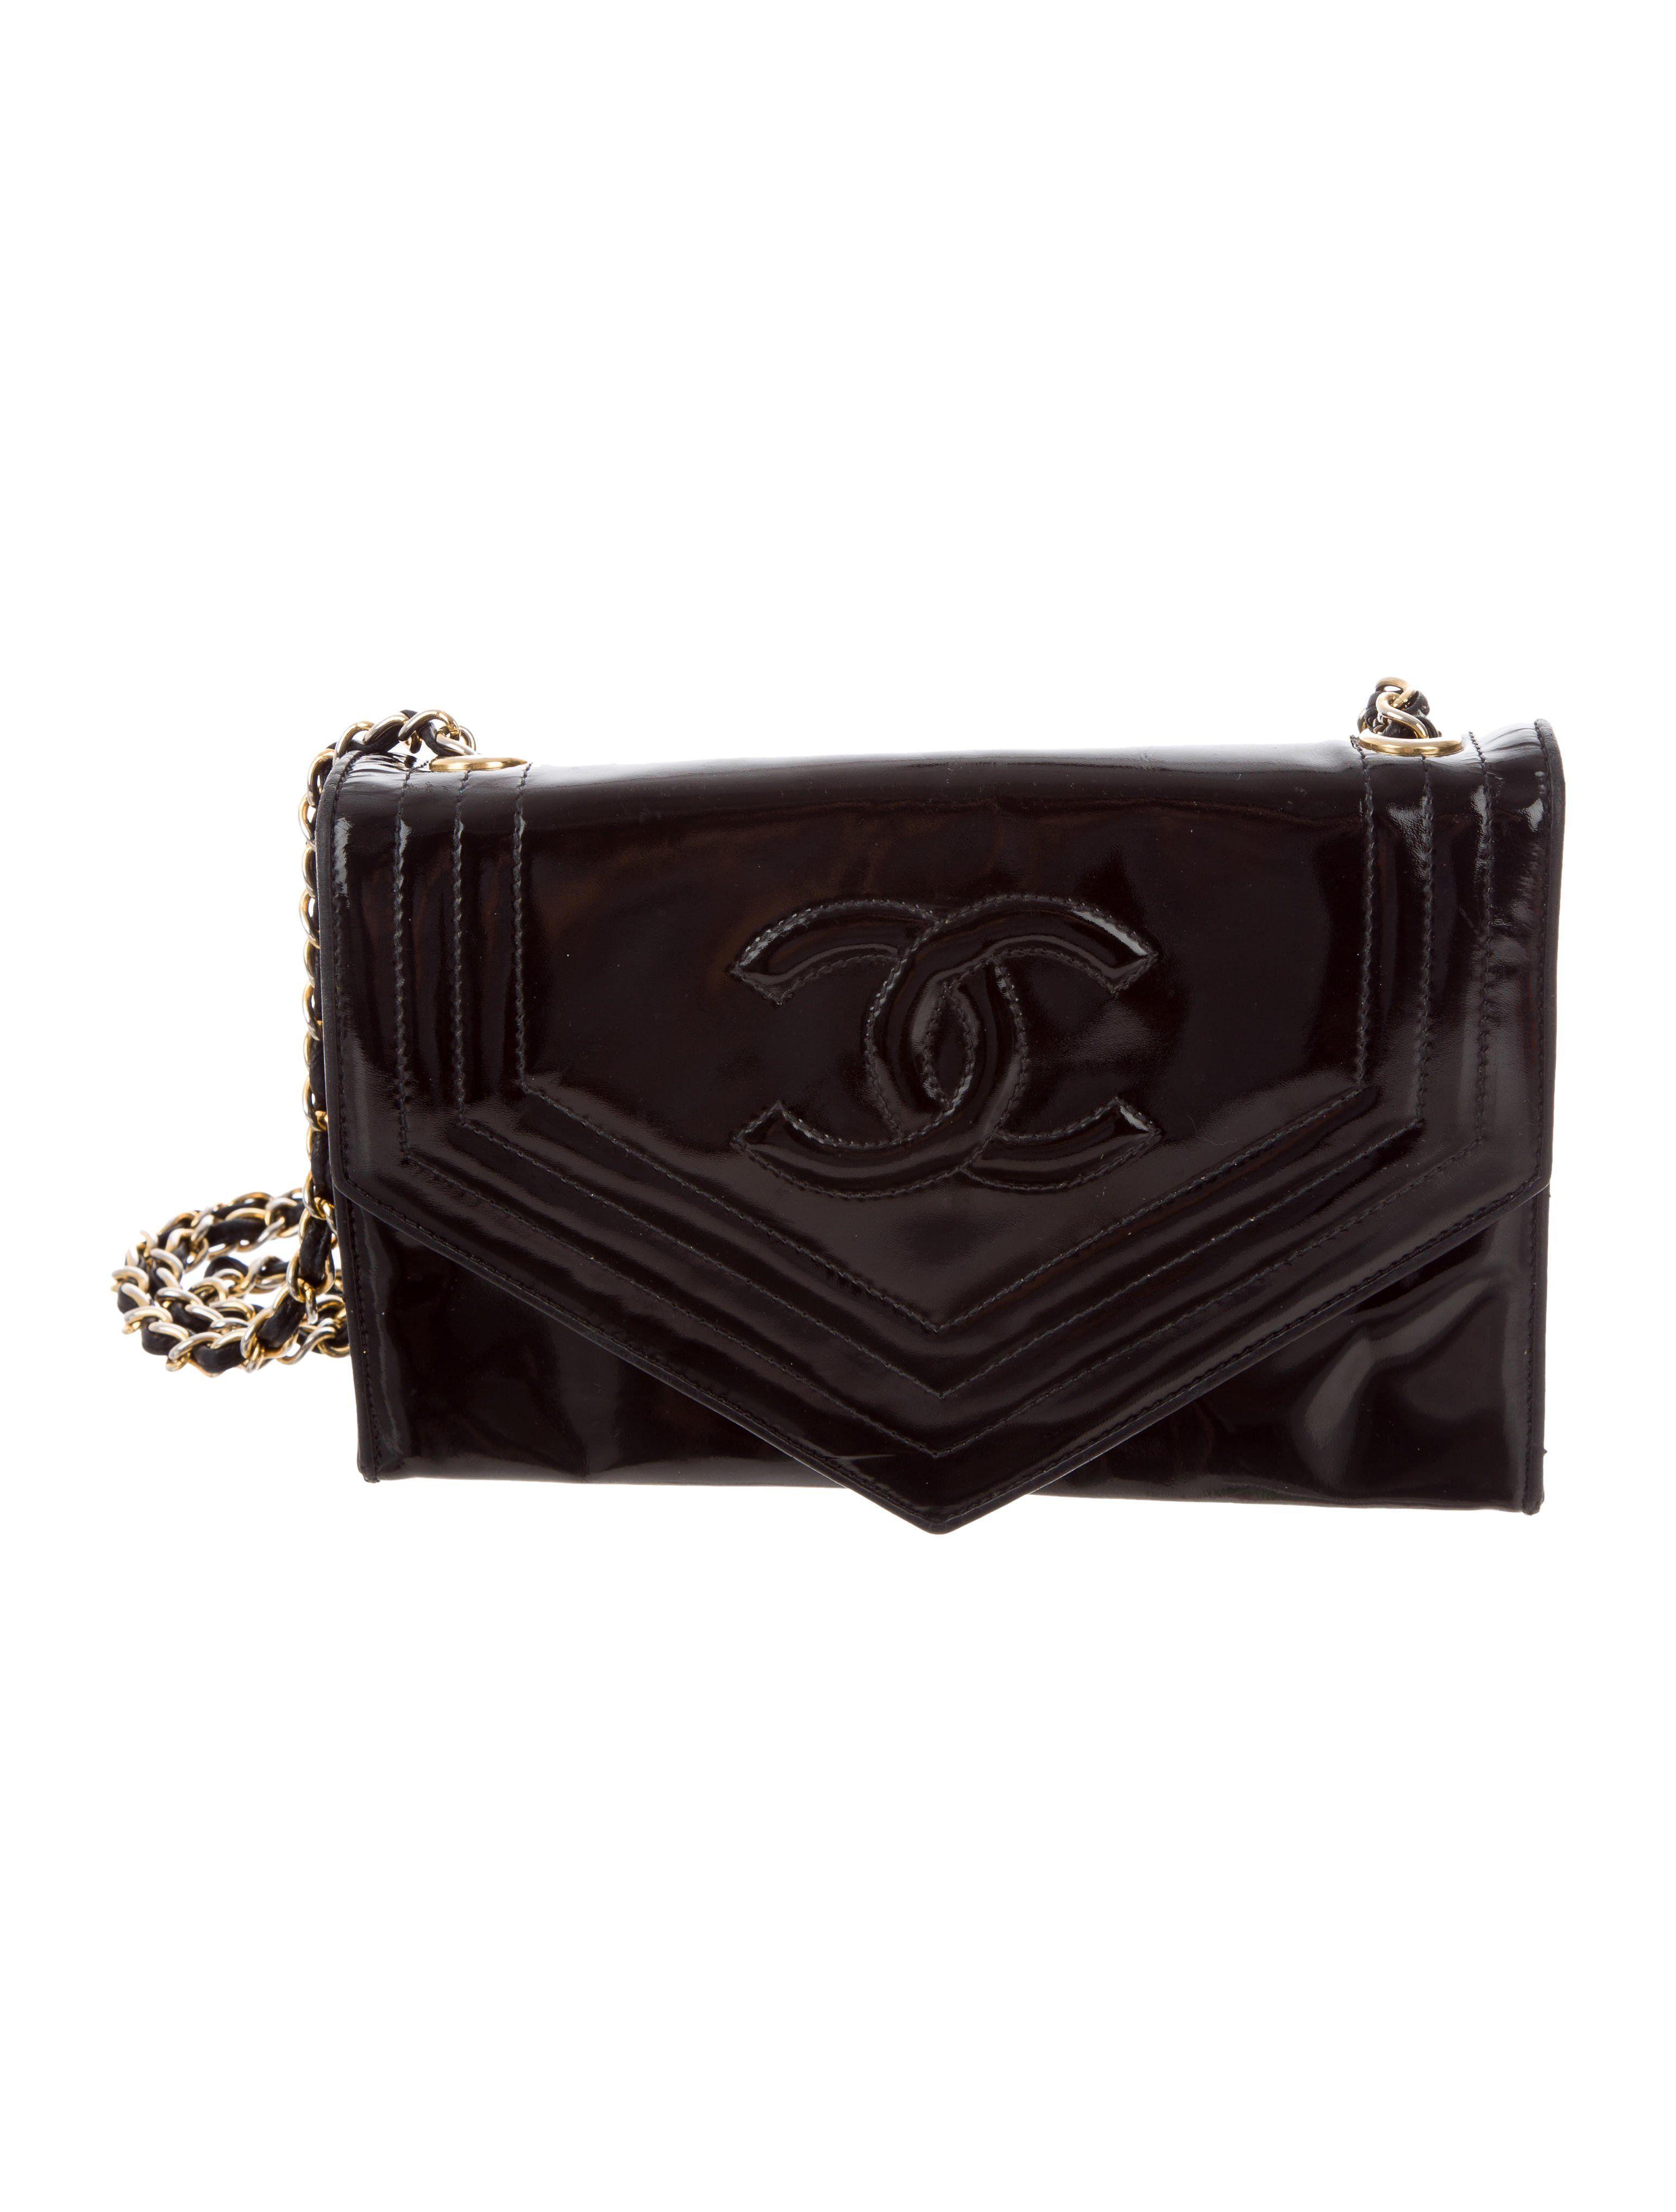 Chanel Vintage Envelope Flap Bag Handbags Cha217754 The Realreal Chanelhandbags Flap Bag Designer Crossbody Bags Bags